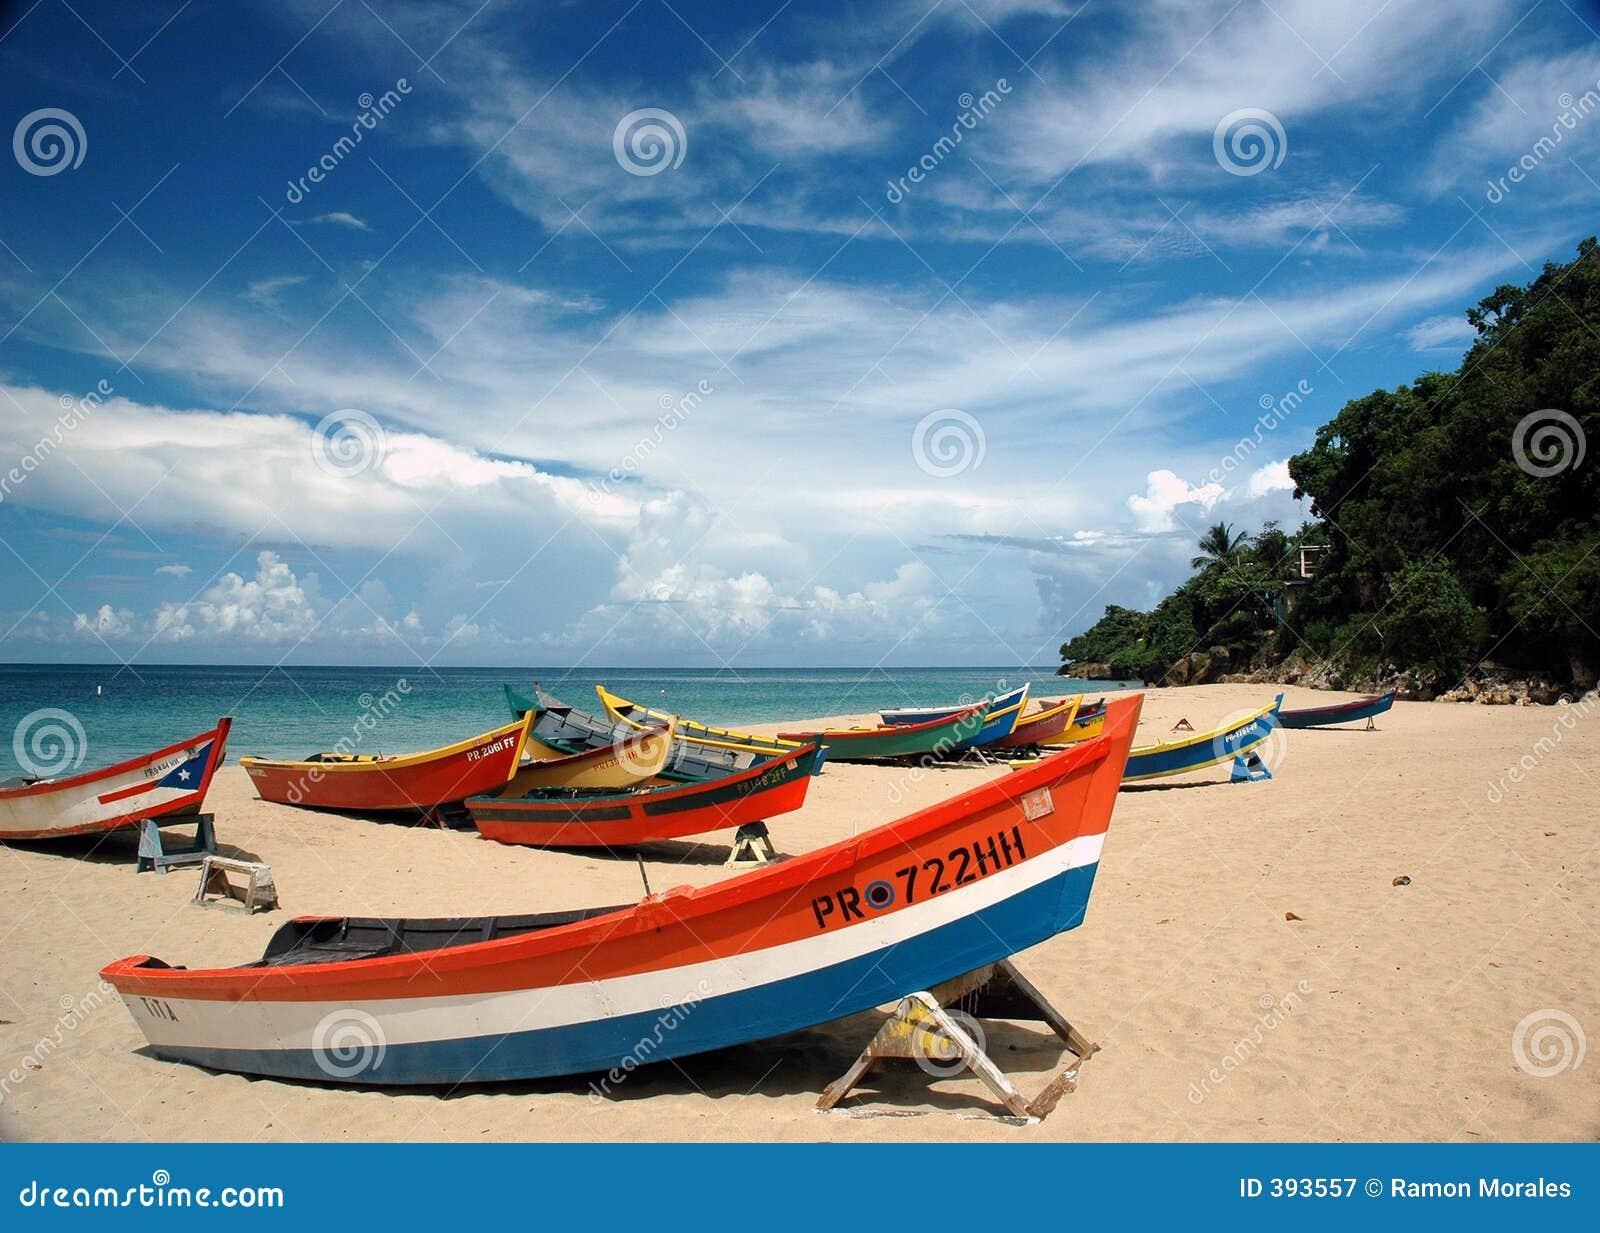 Boats Scene